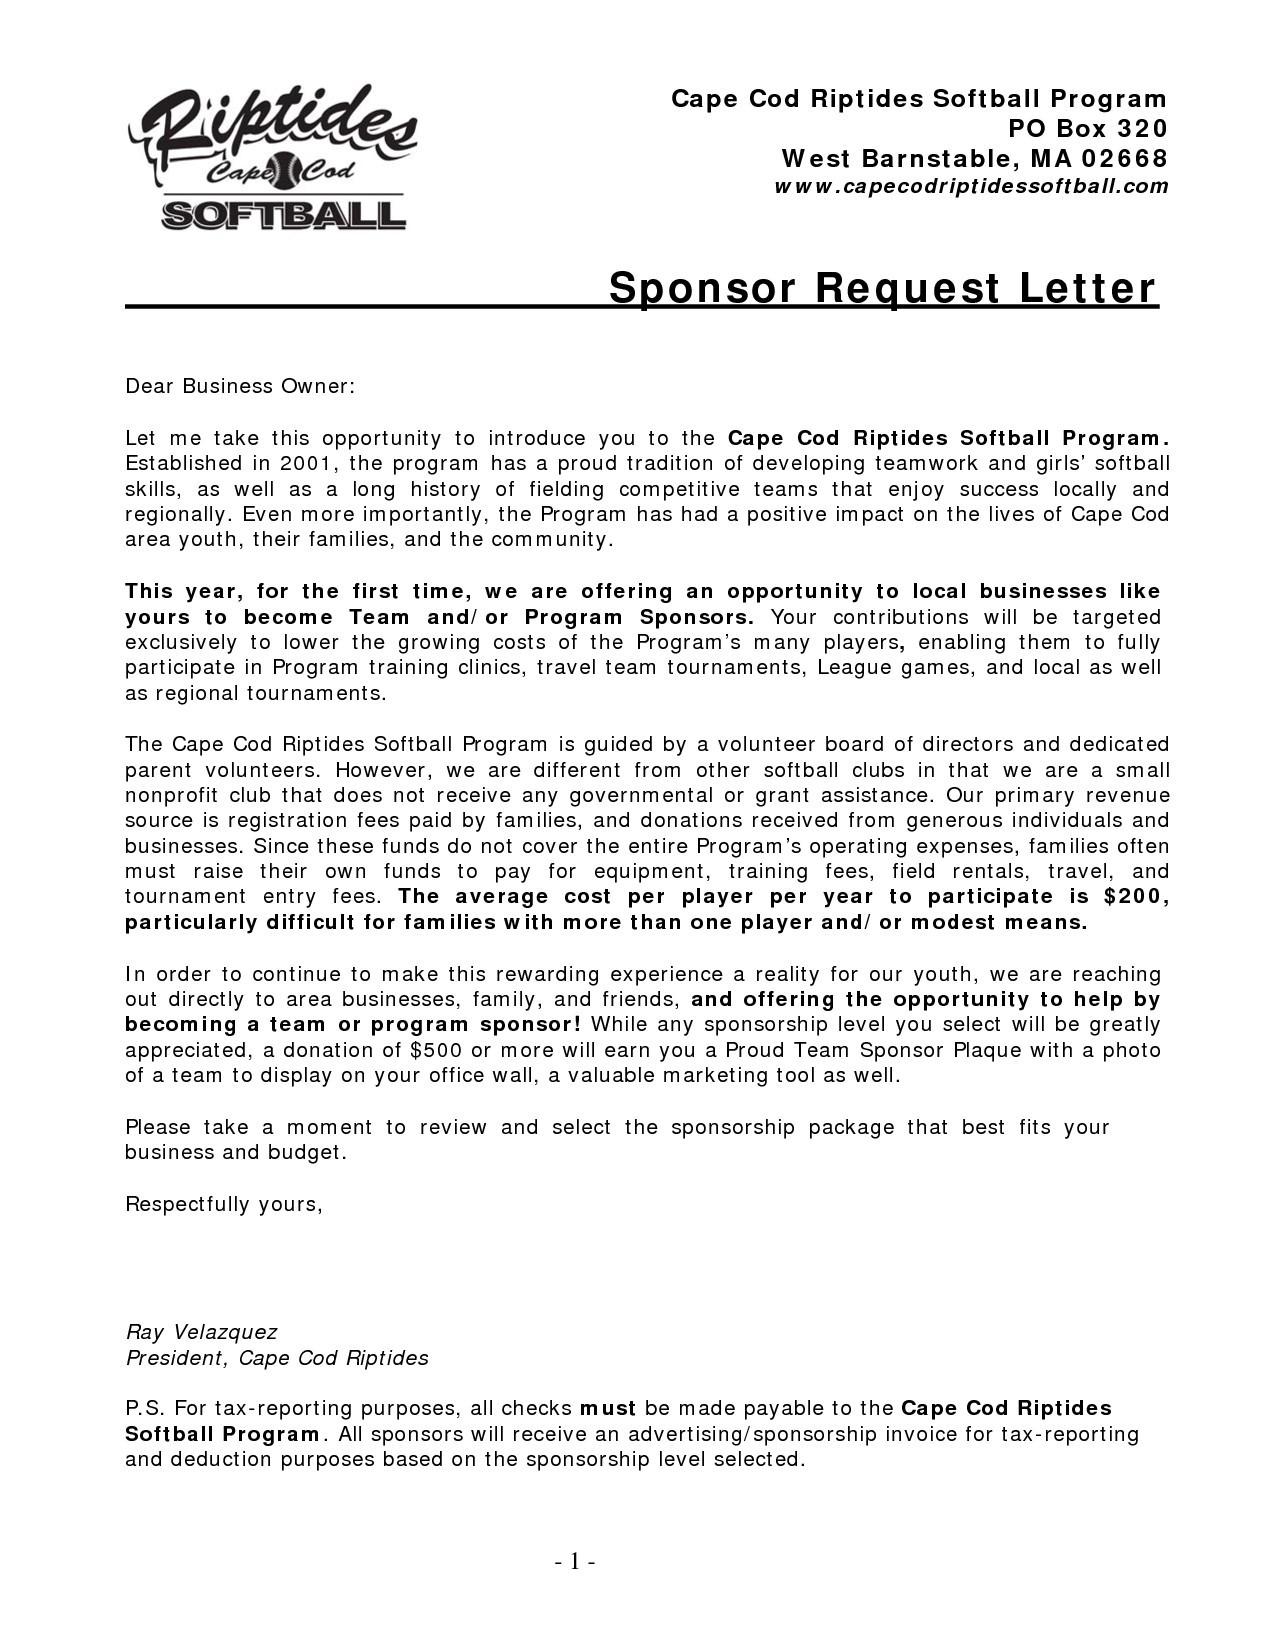 charity sponsorship letter template sponsorship request letter pdf save sample registration letter